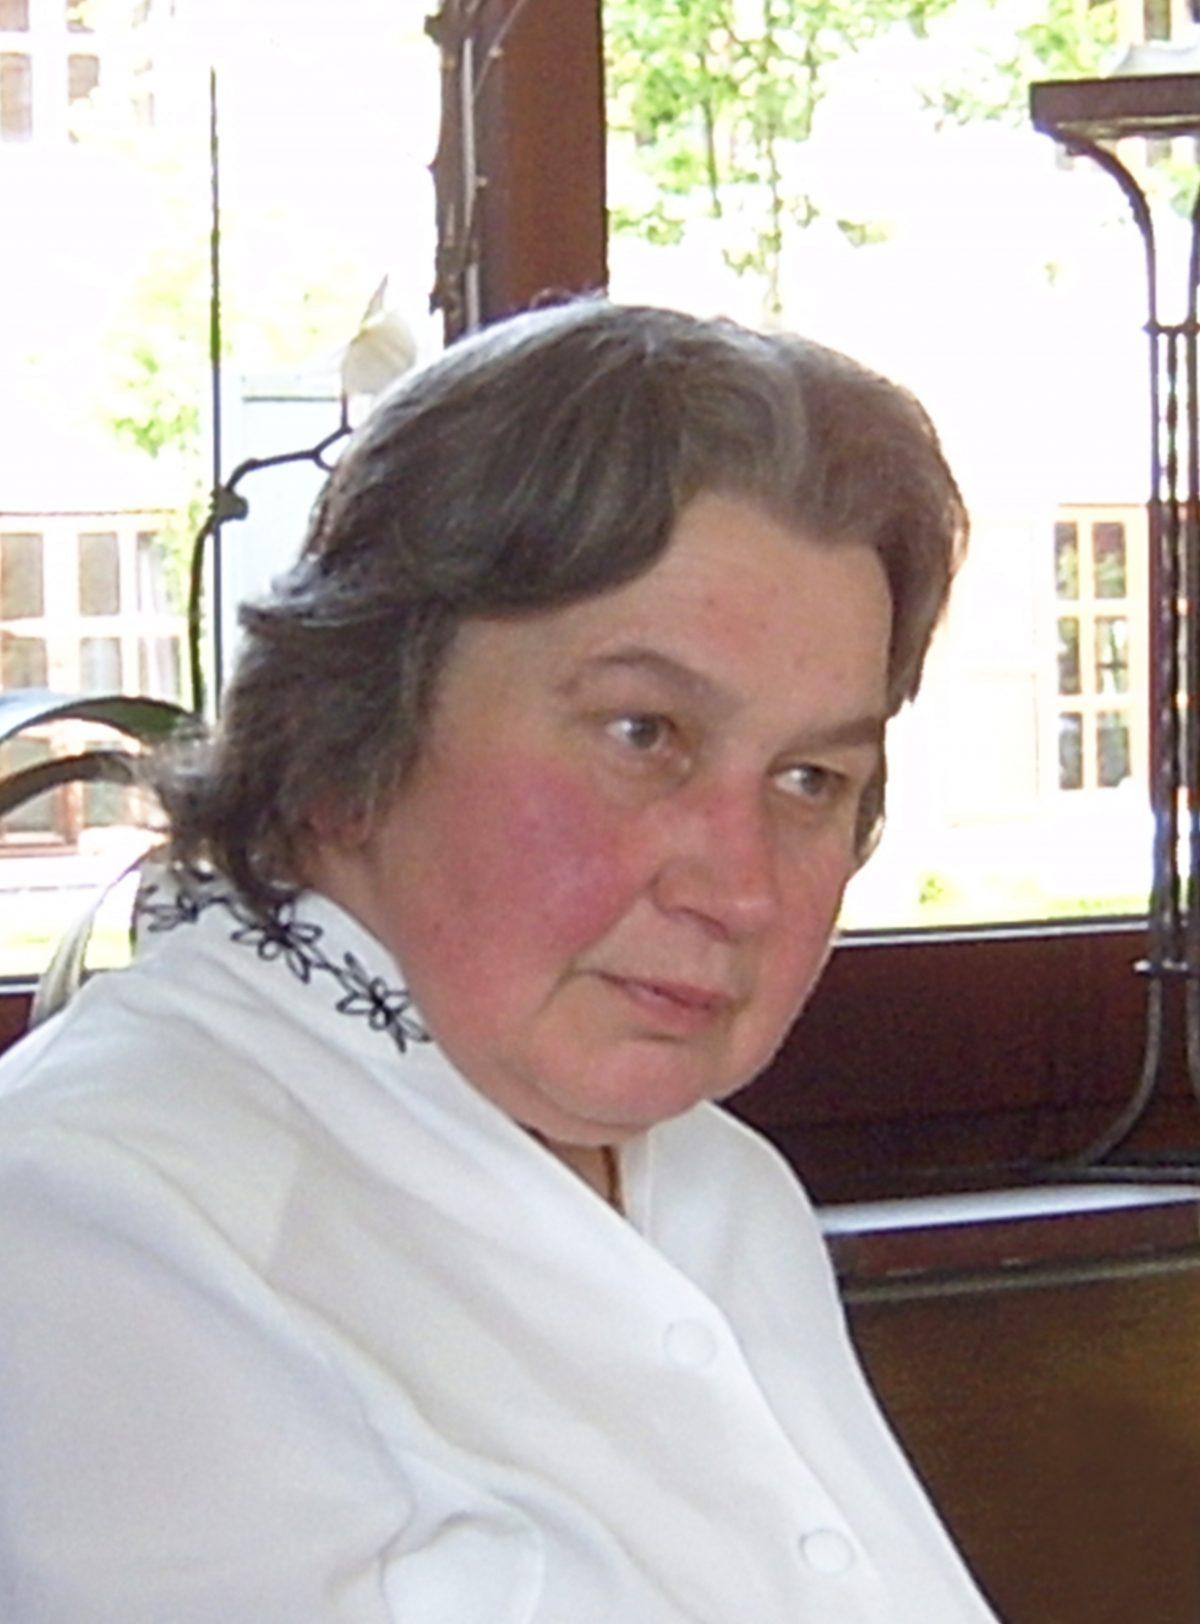 Idalie Thijs